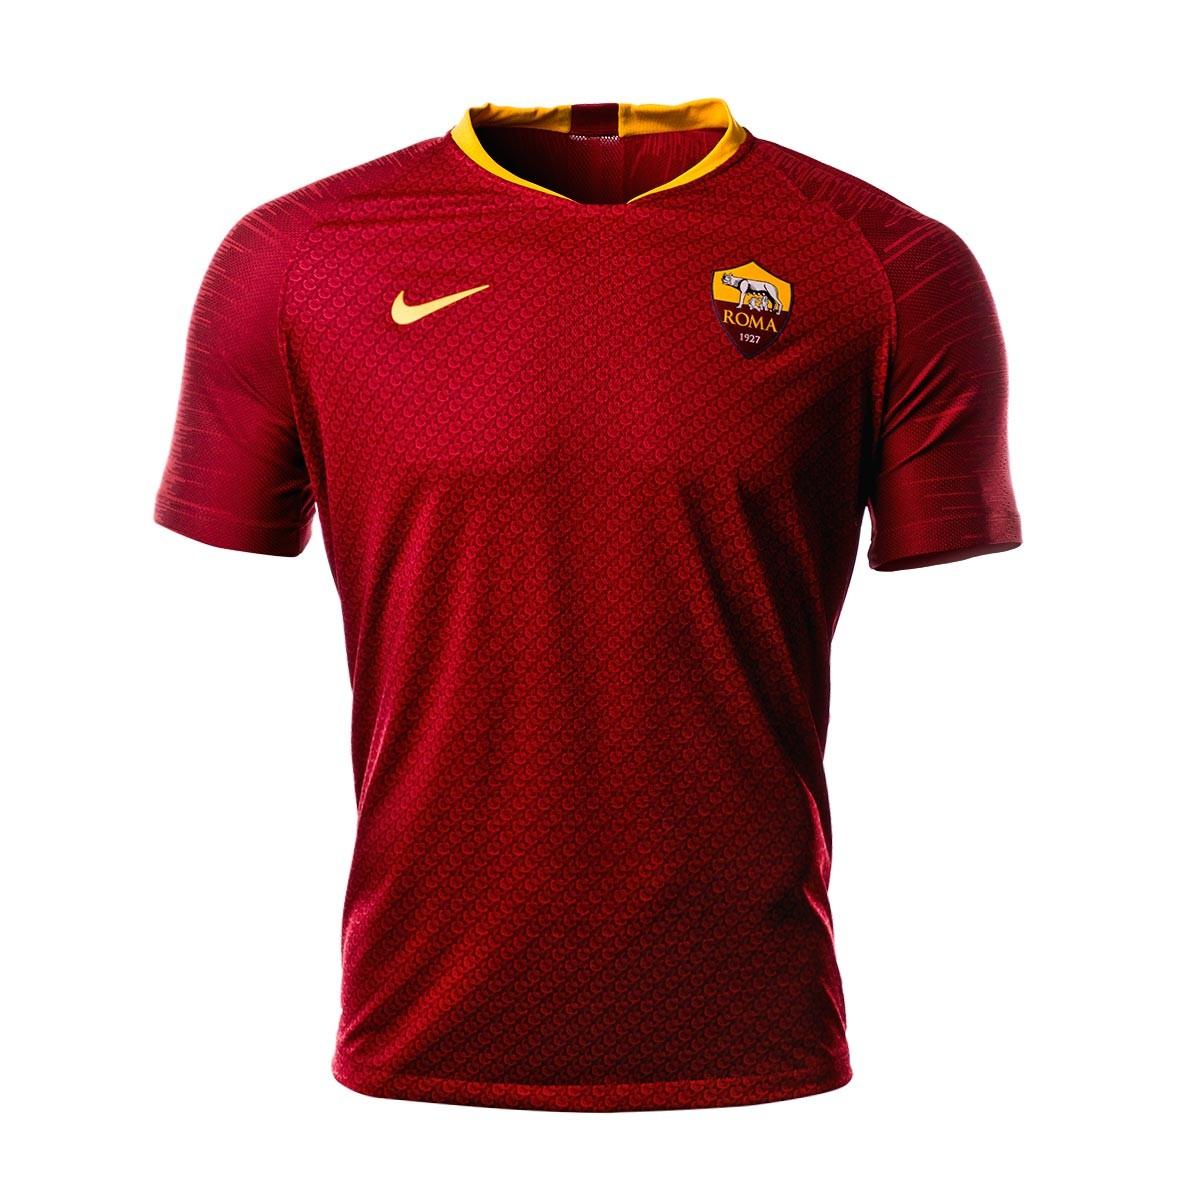 competitive price ac56a 70fa0 Categorías de la Camiseta